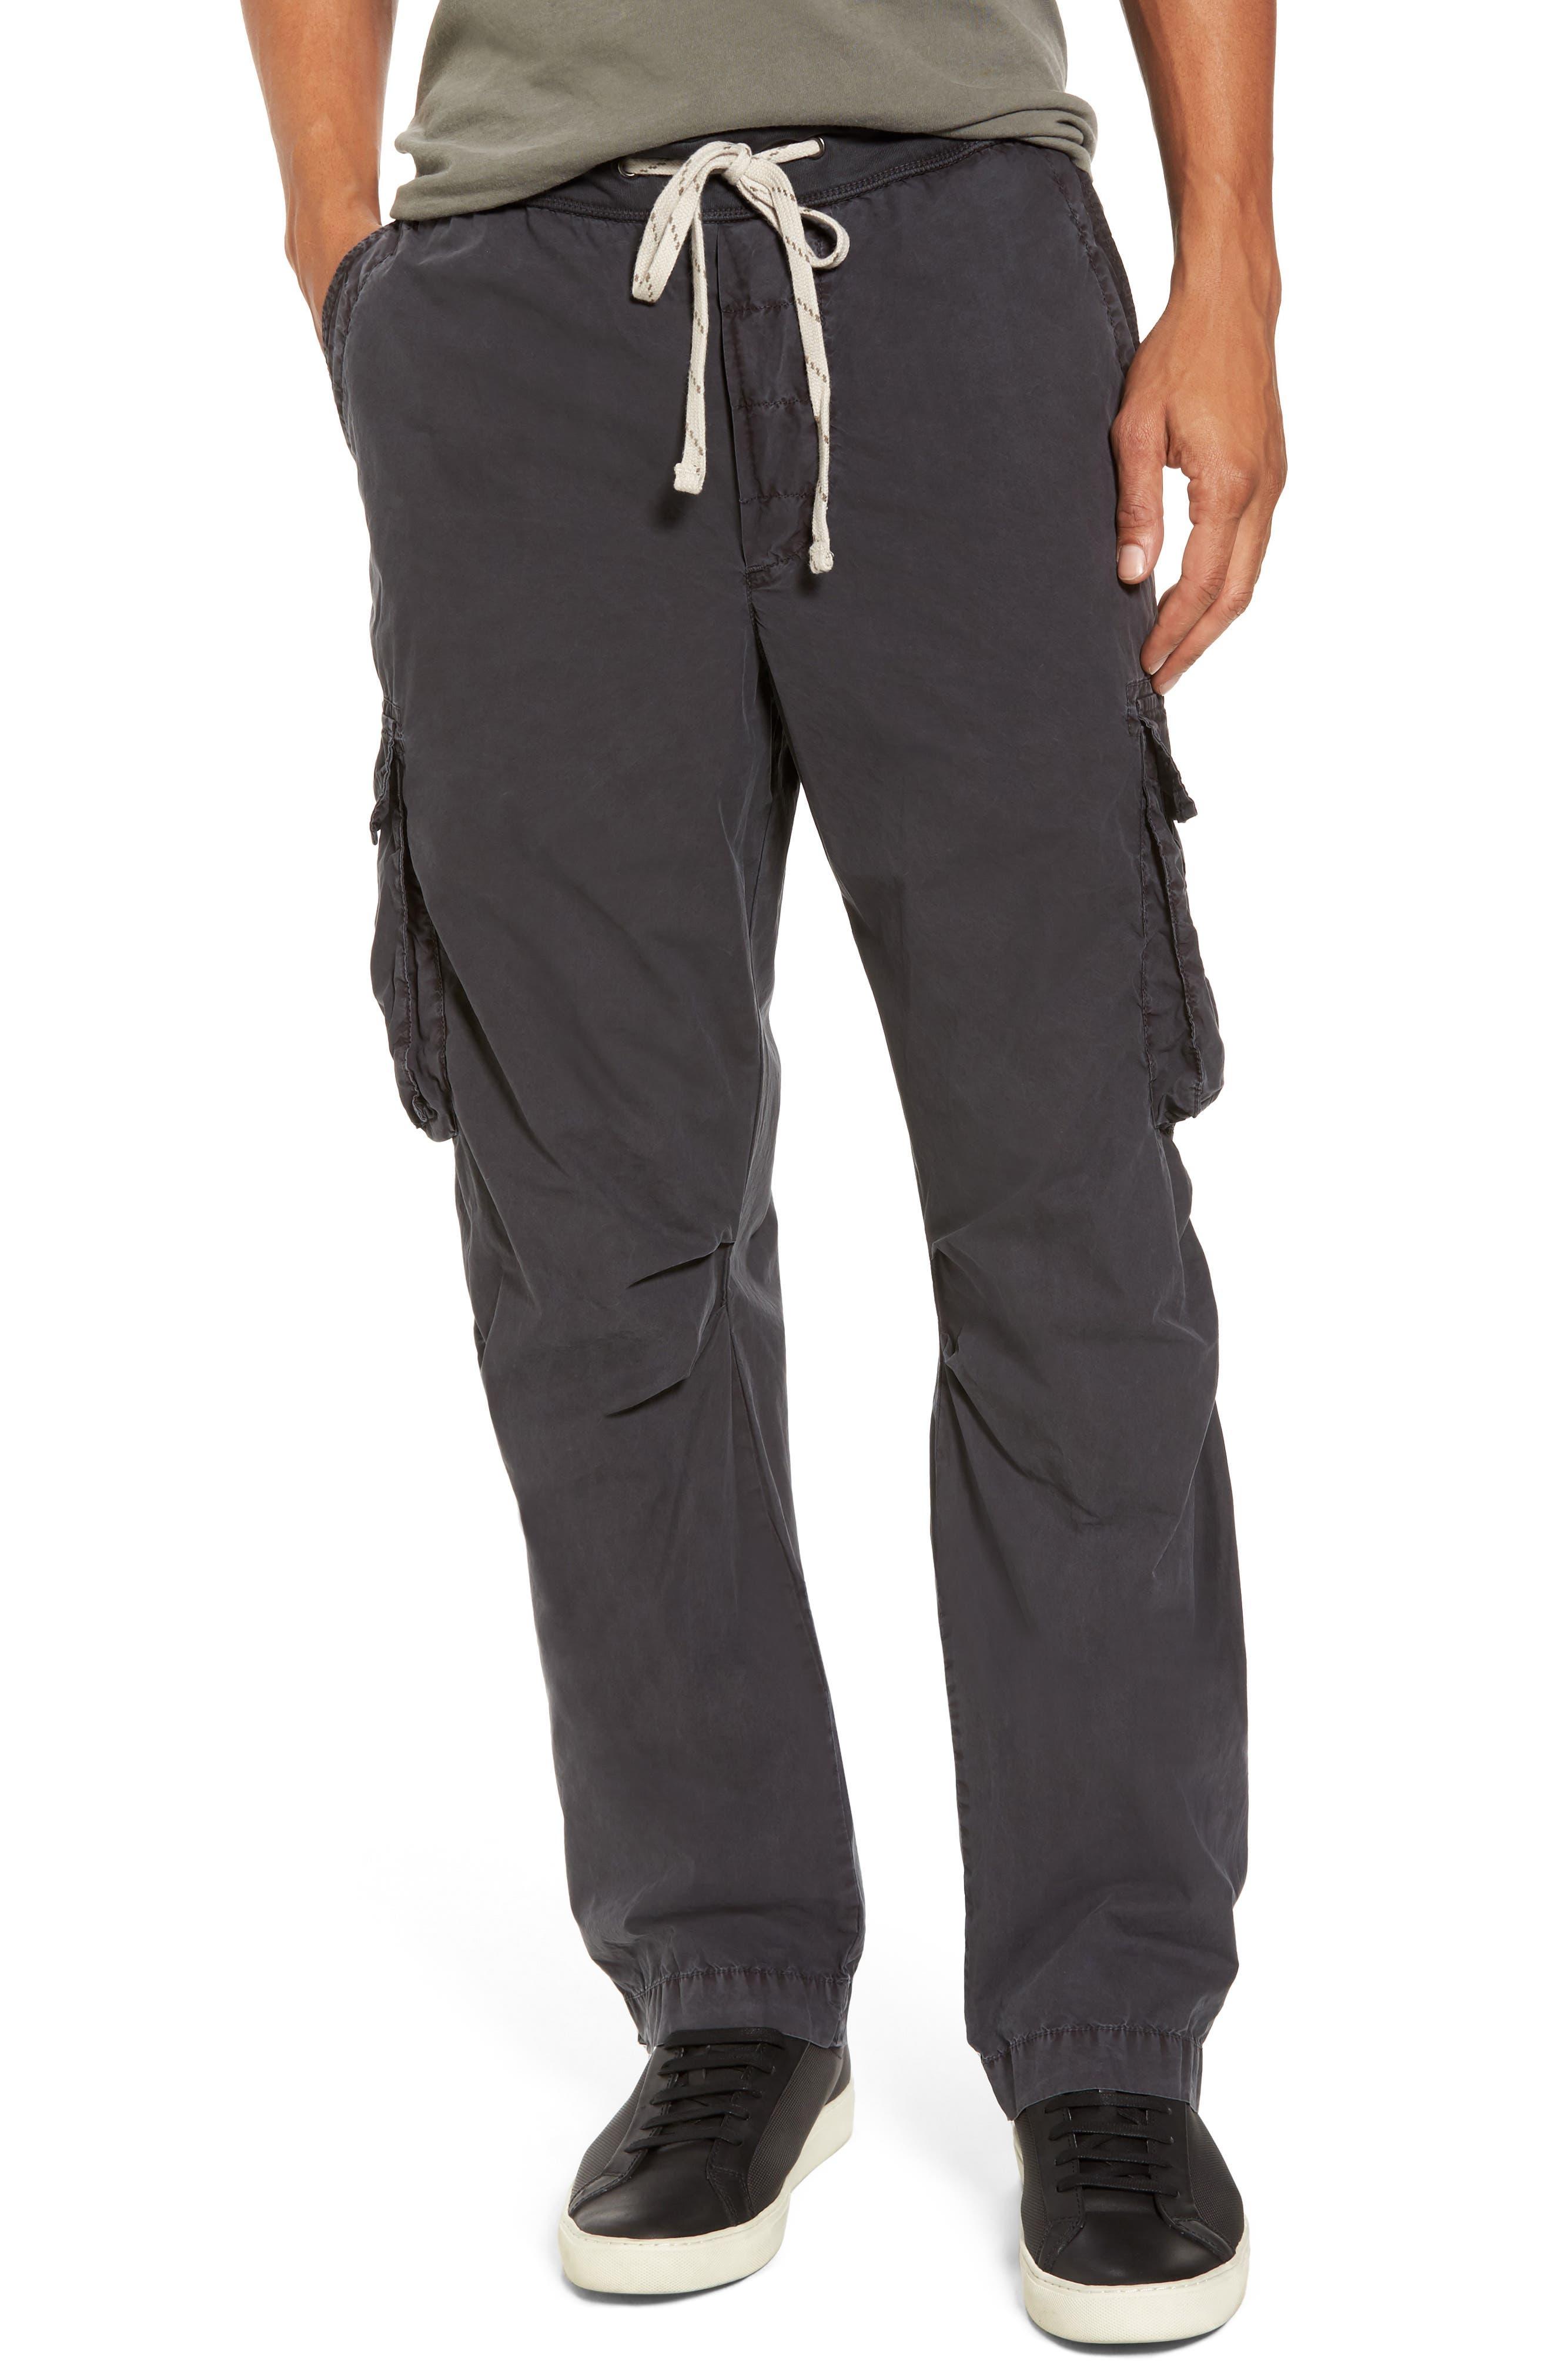 James Perse Contrast Waist Cargo Pants